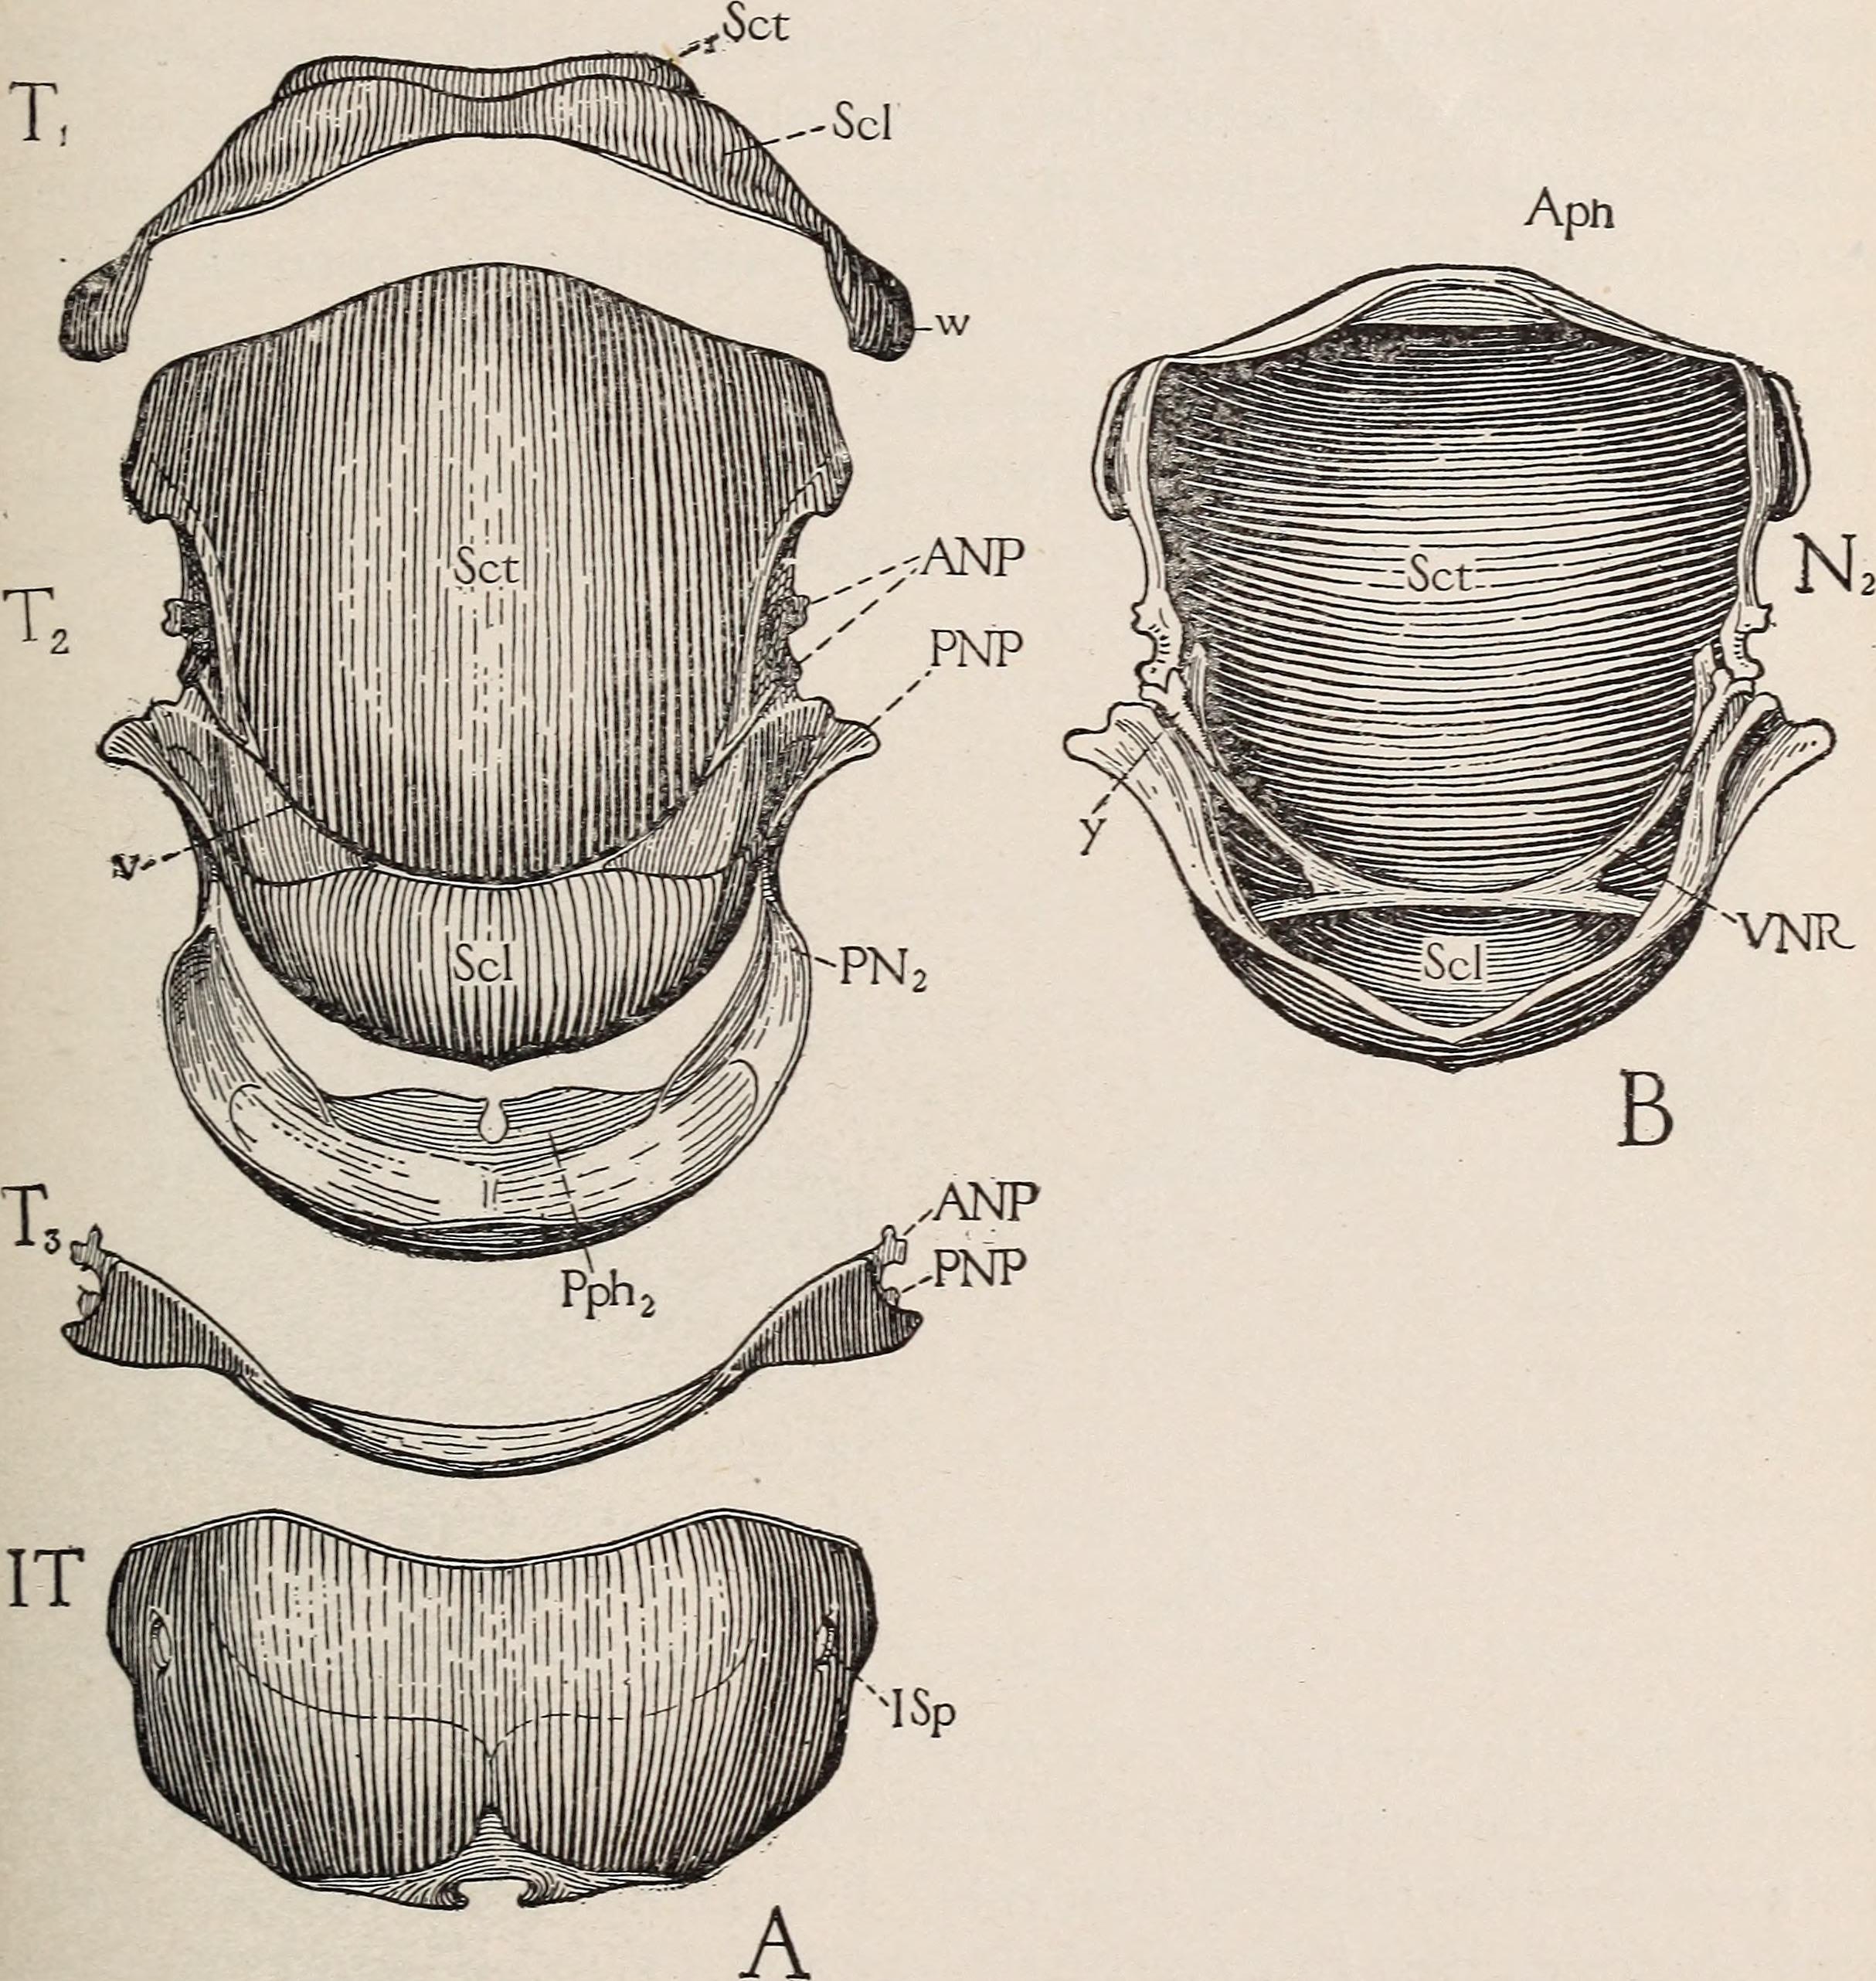 Filethe Anatomy Of The Honey Bee 1910 18168034436g